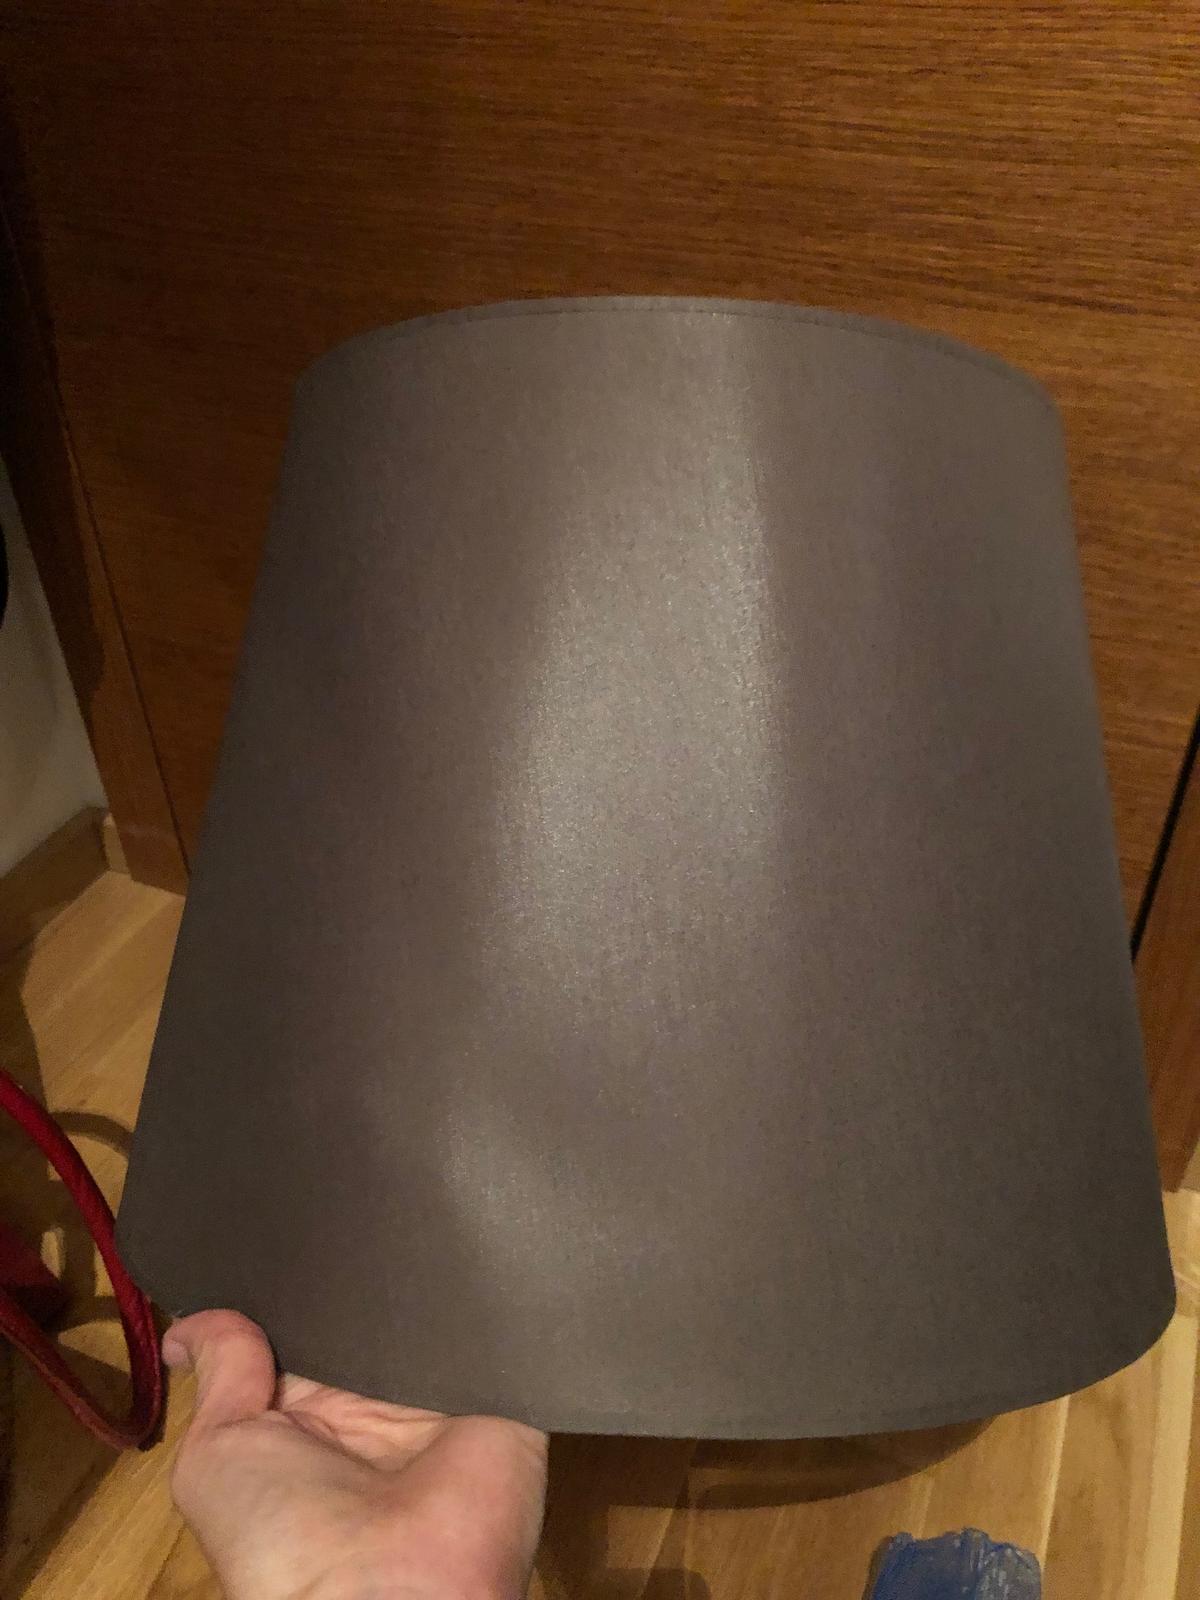 Hodvabne tienidlo na stolovu/stojacu lampu - Obrázok č. 1